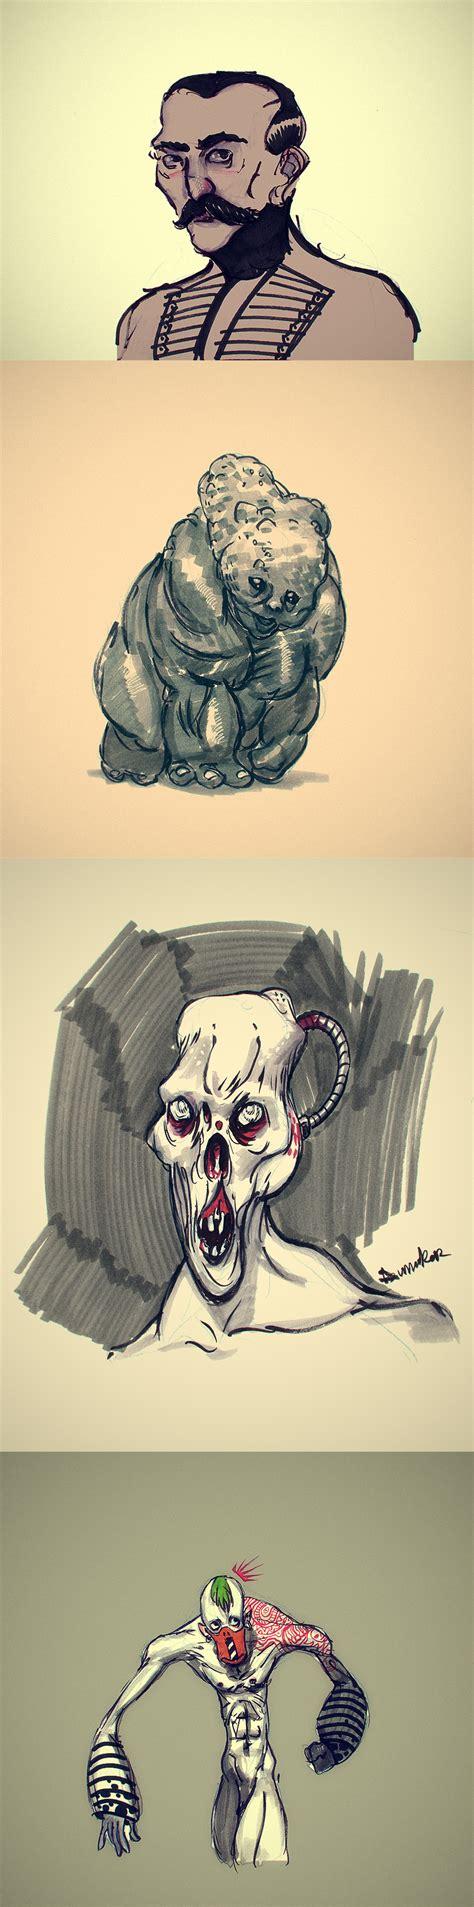 Handmade Sketches - handmade sketches 002 by dumaker on deviantart